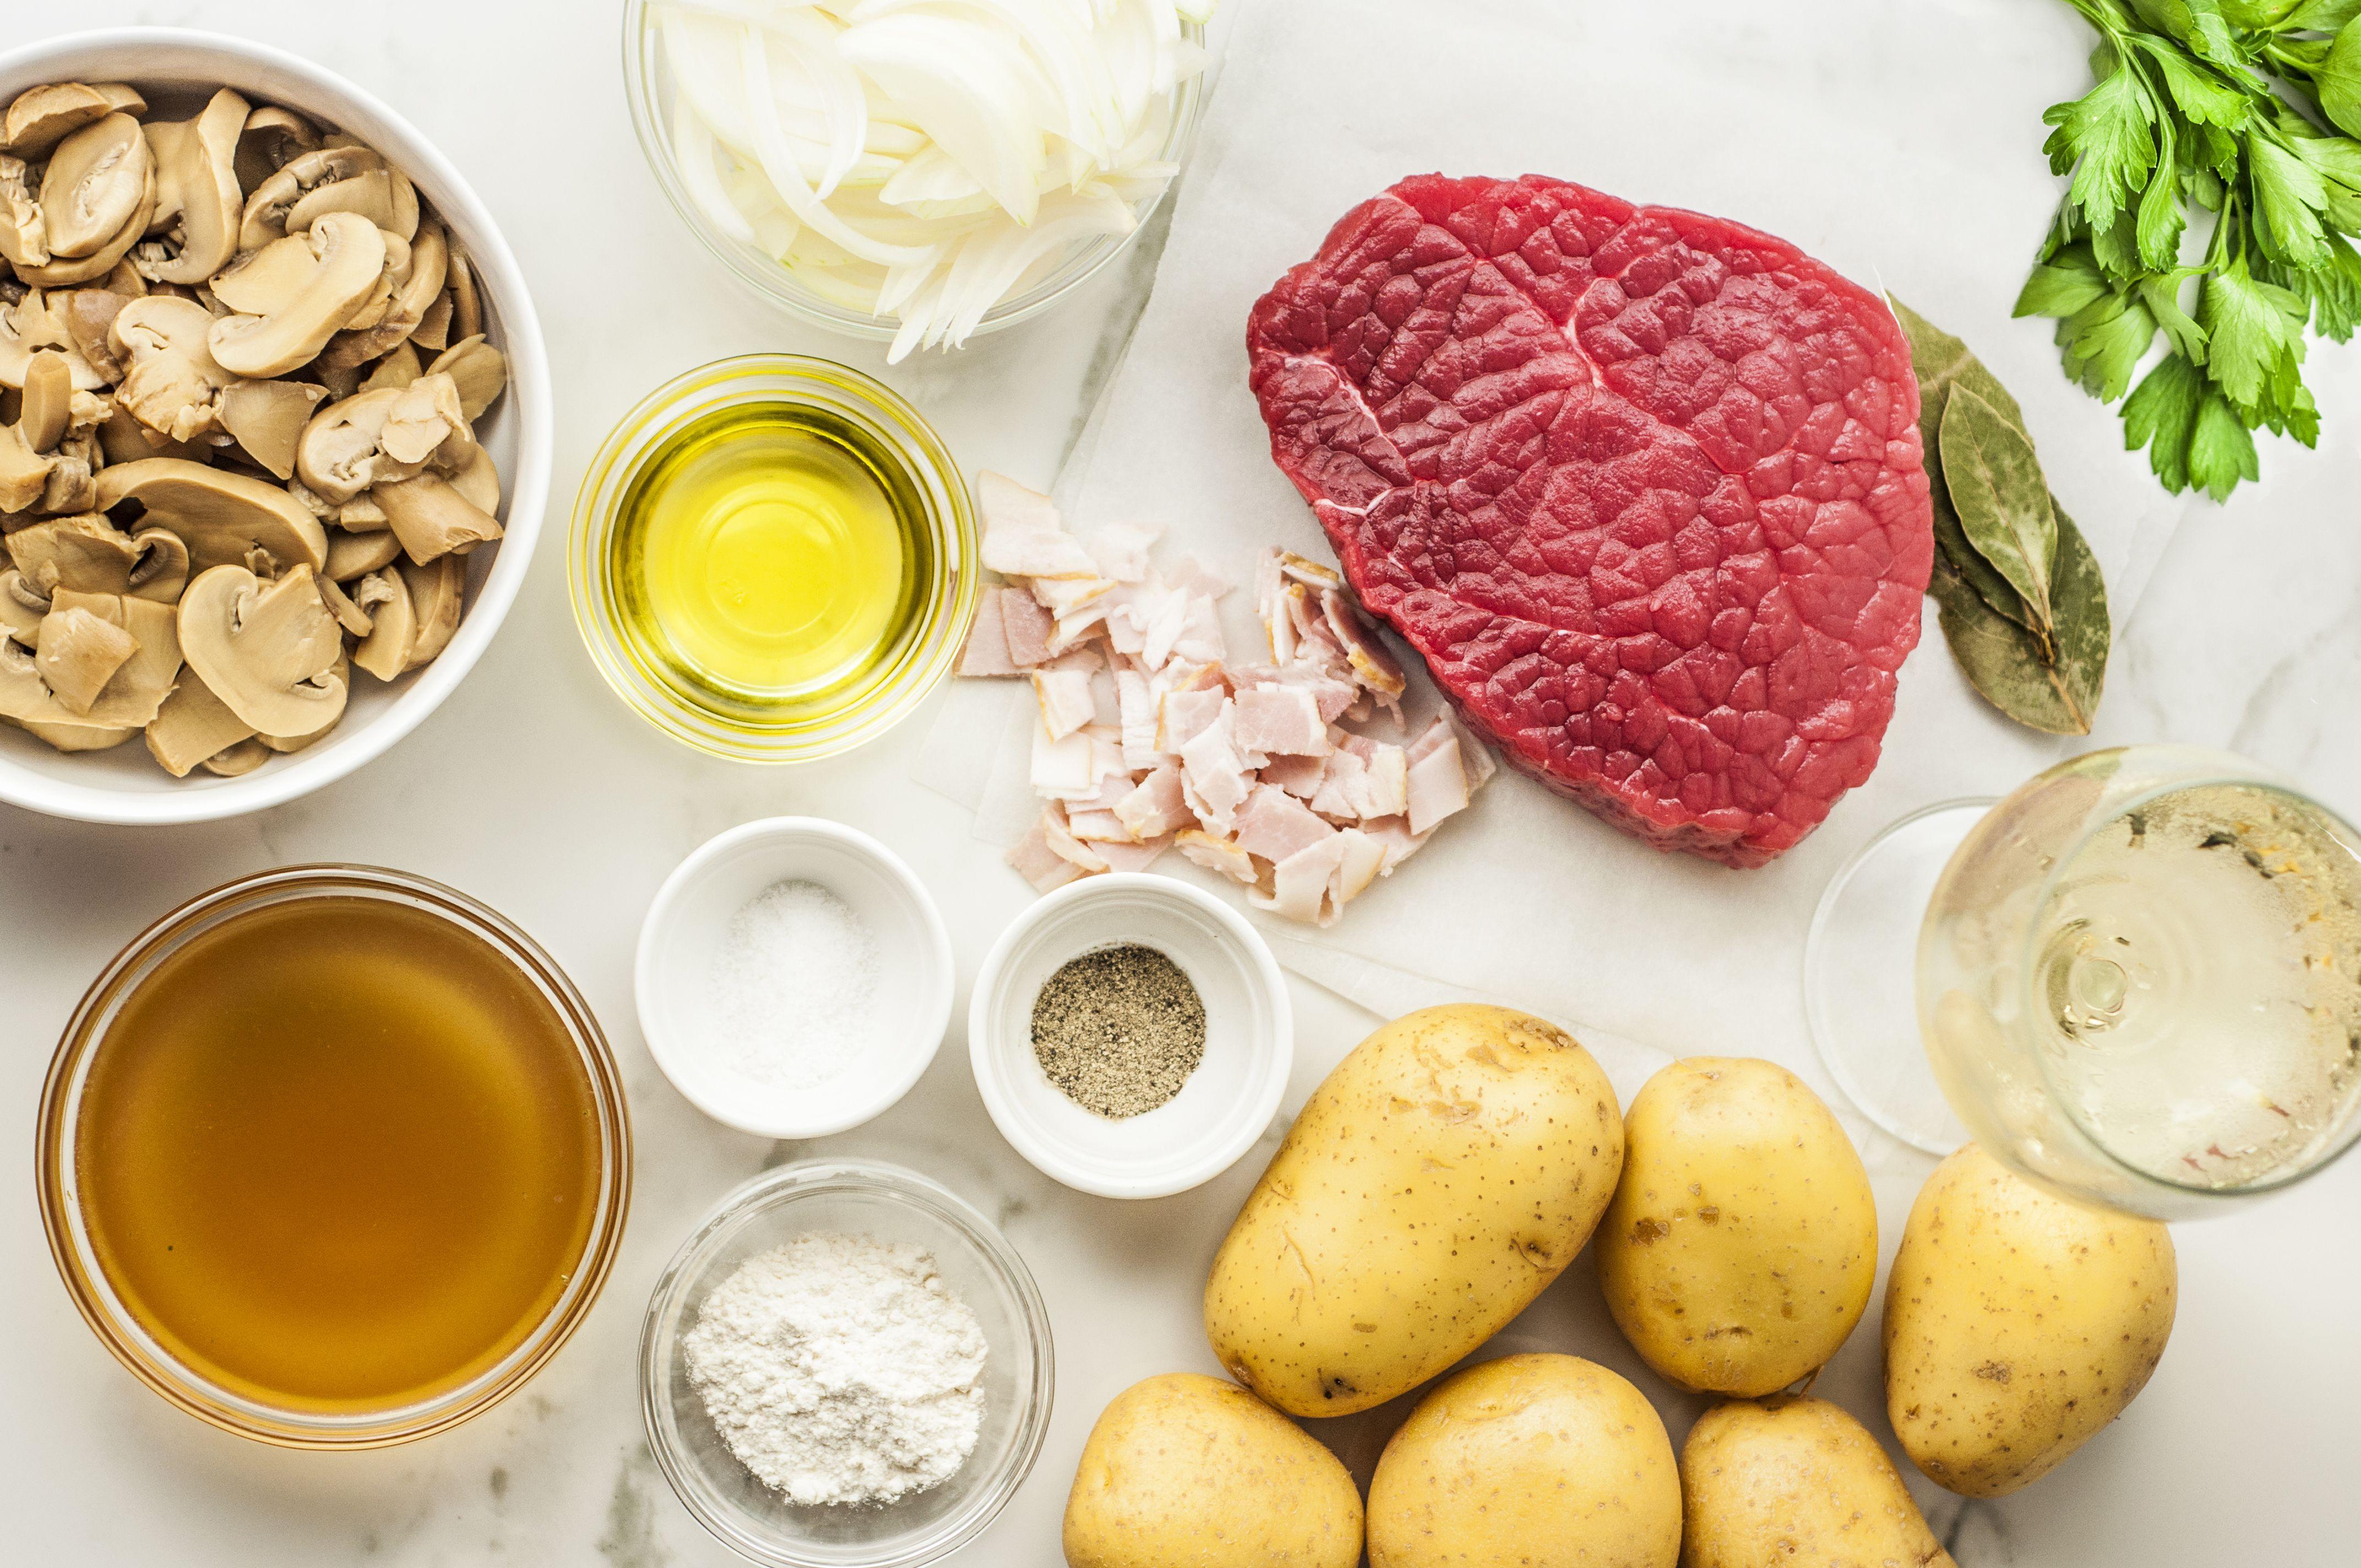 Round Steak and Vegetables recipe